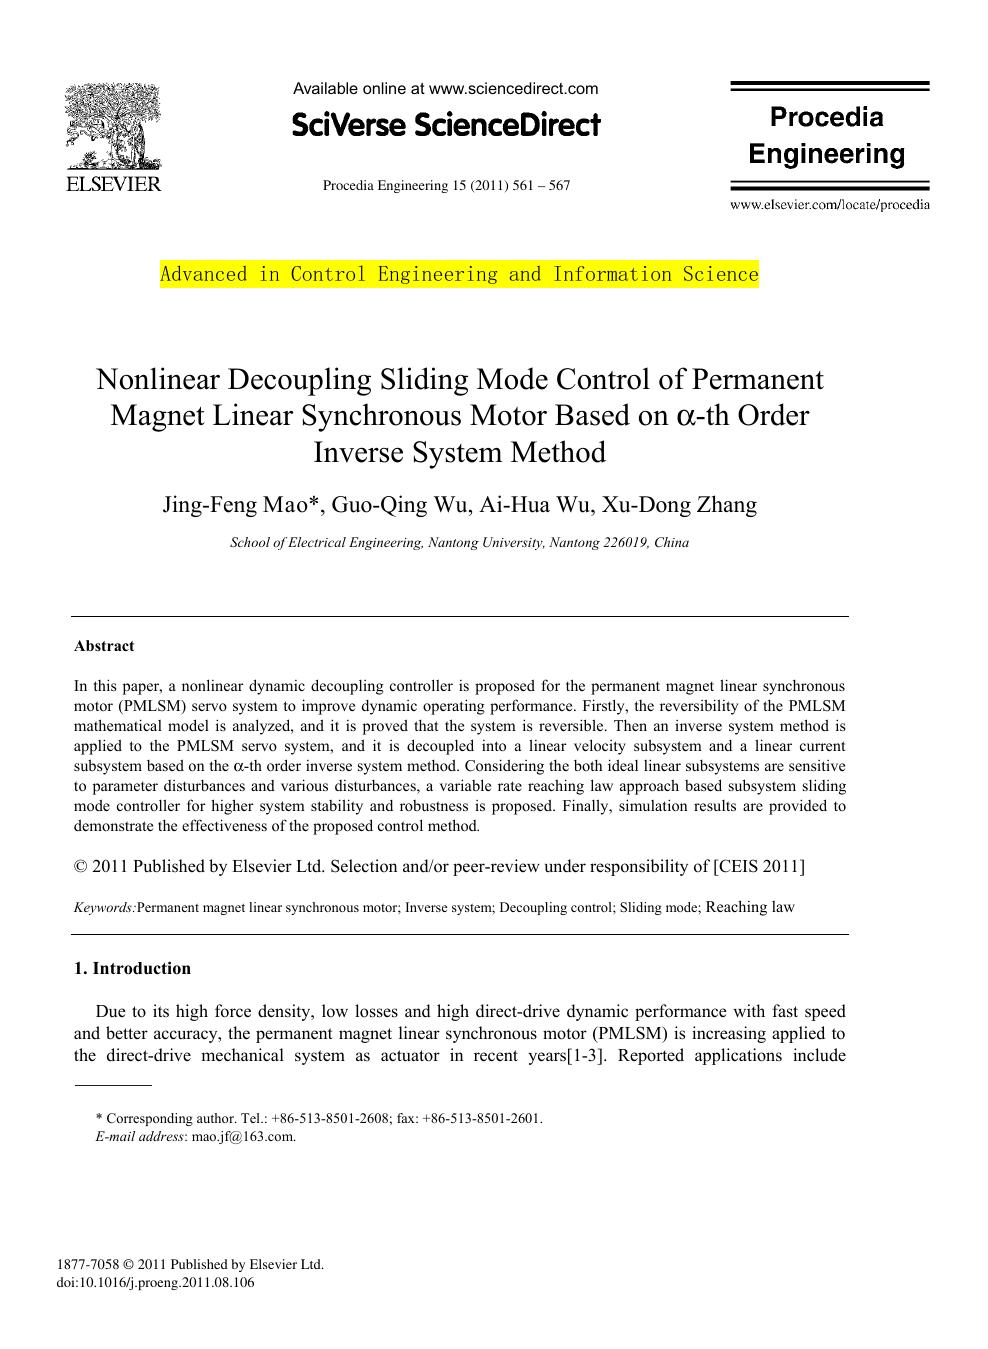 Nonlinear Decoupling Sliding Mode Control of Permanent